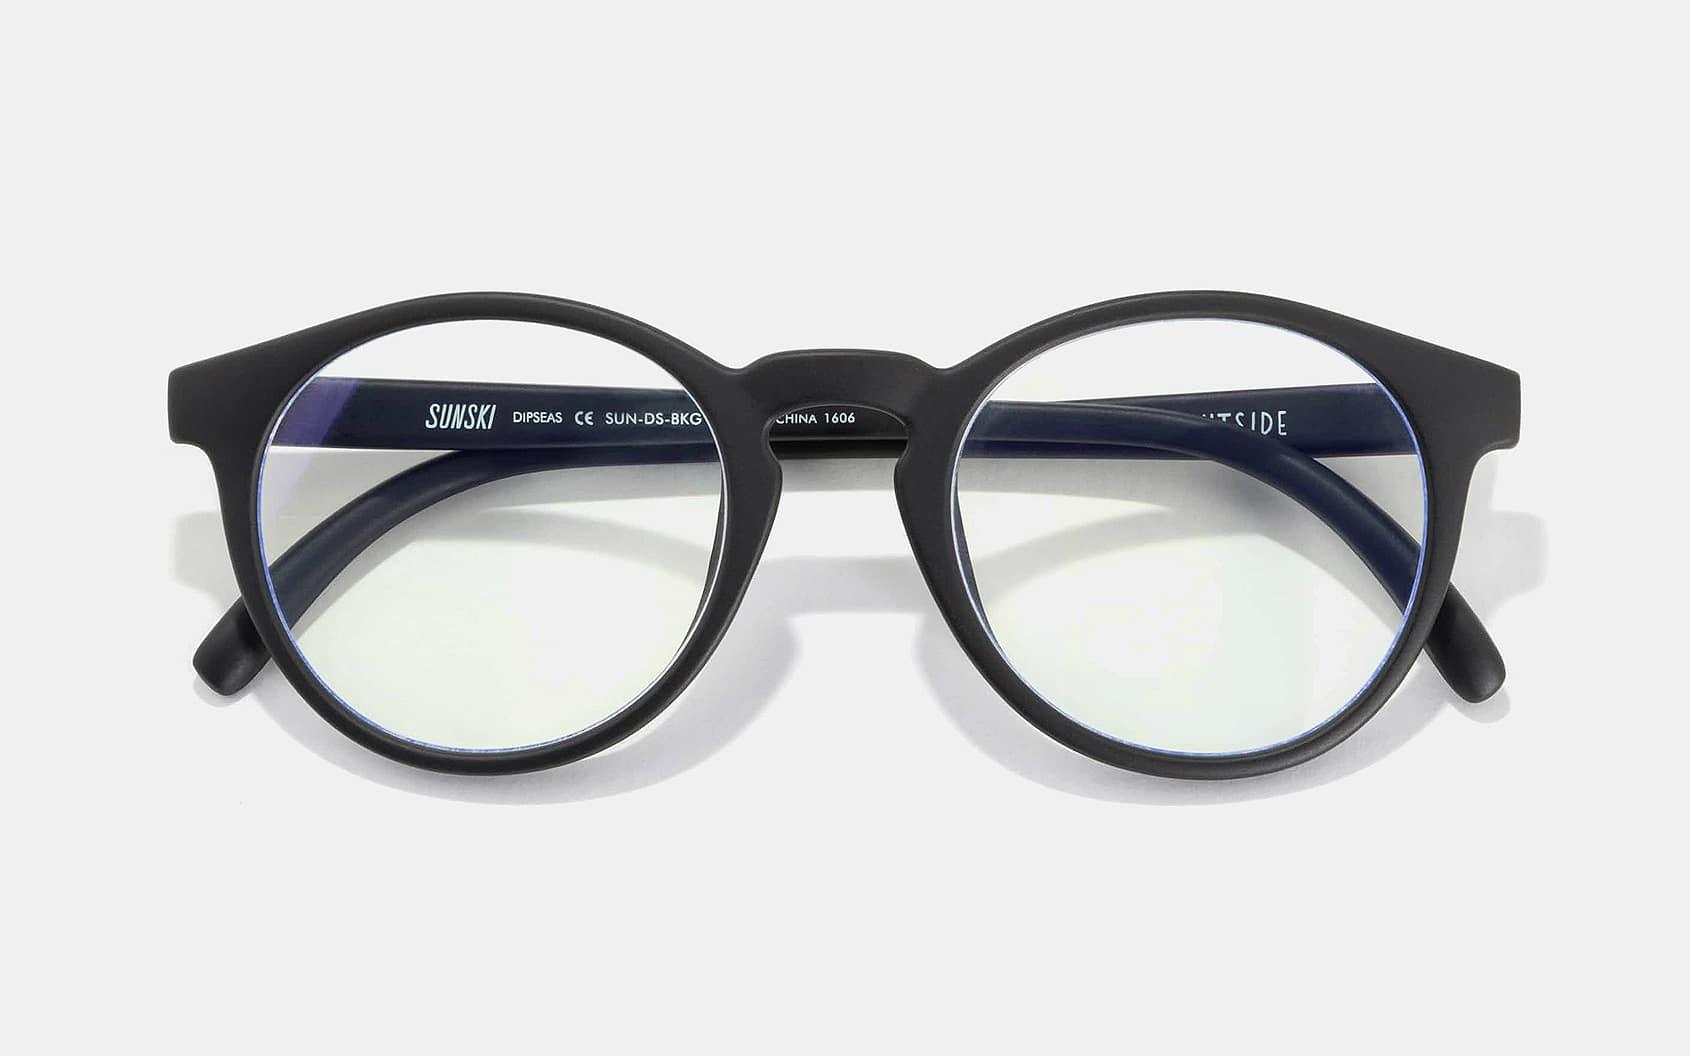 Sunski Dipseas Blue Light-Blocking Glasses